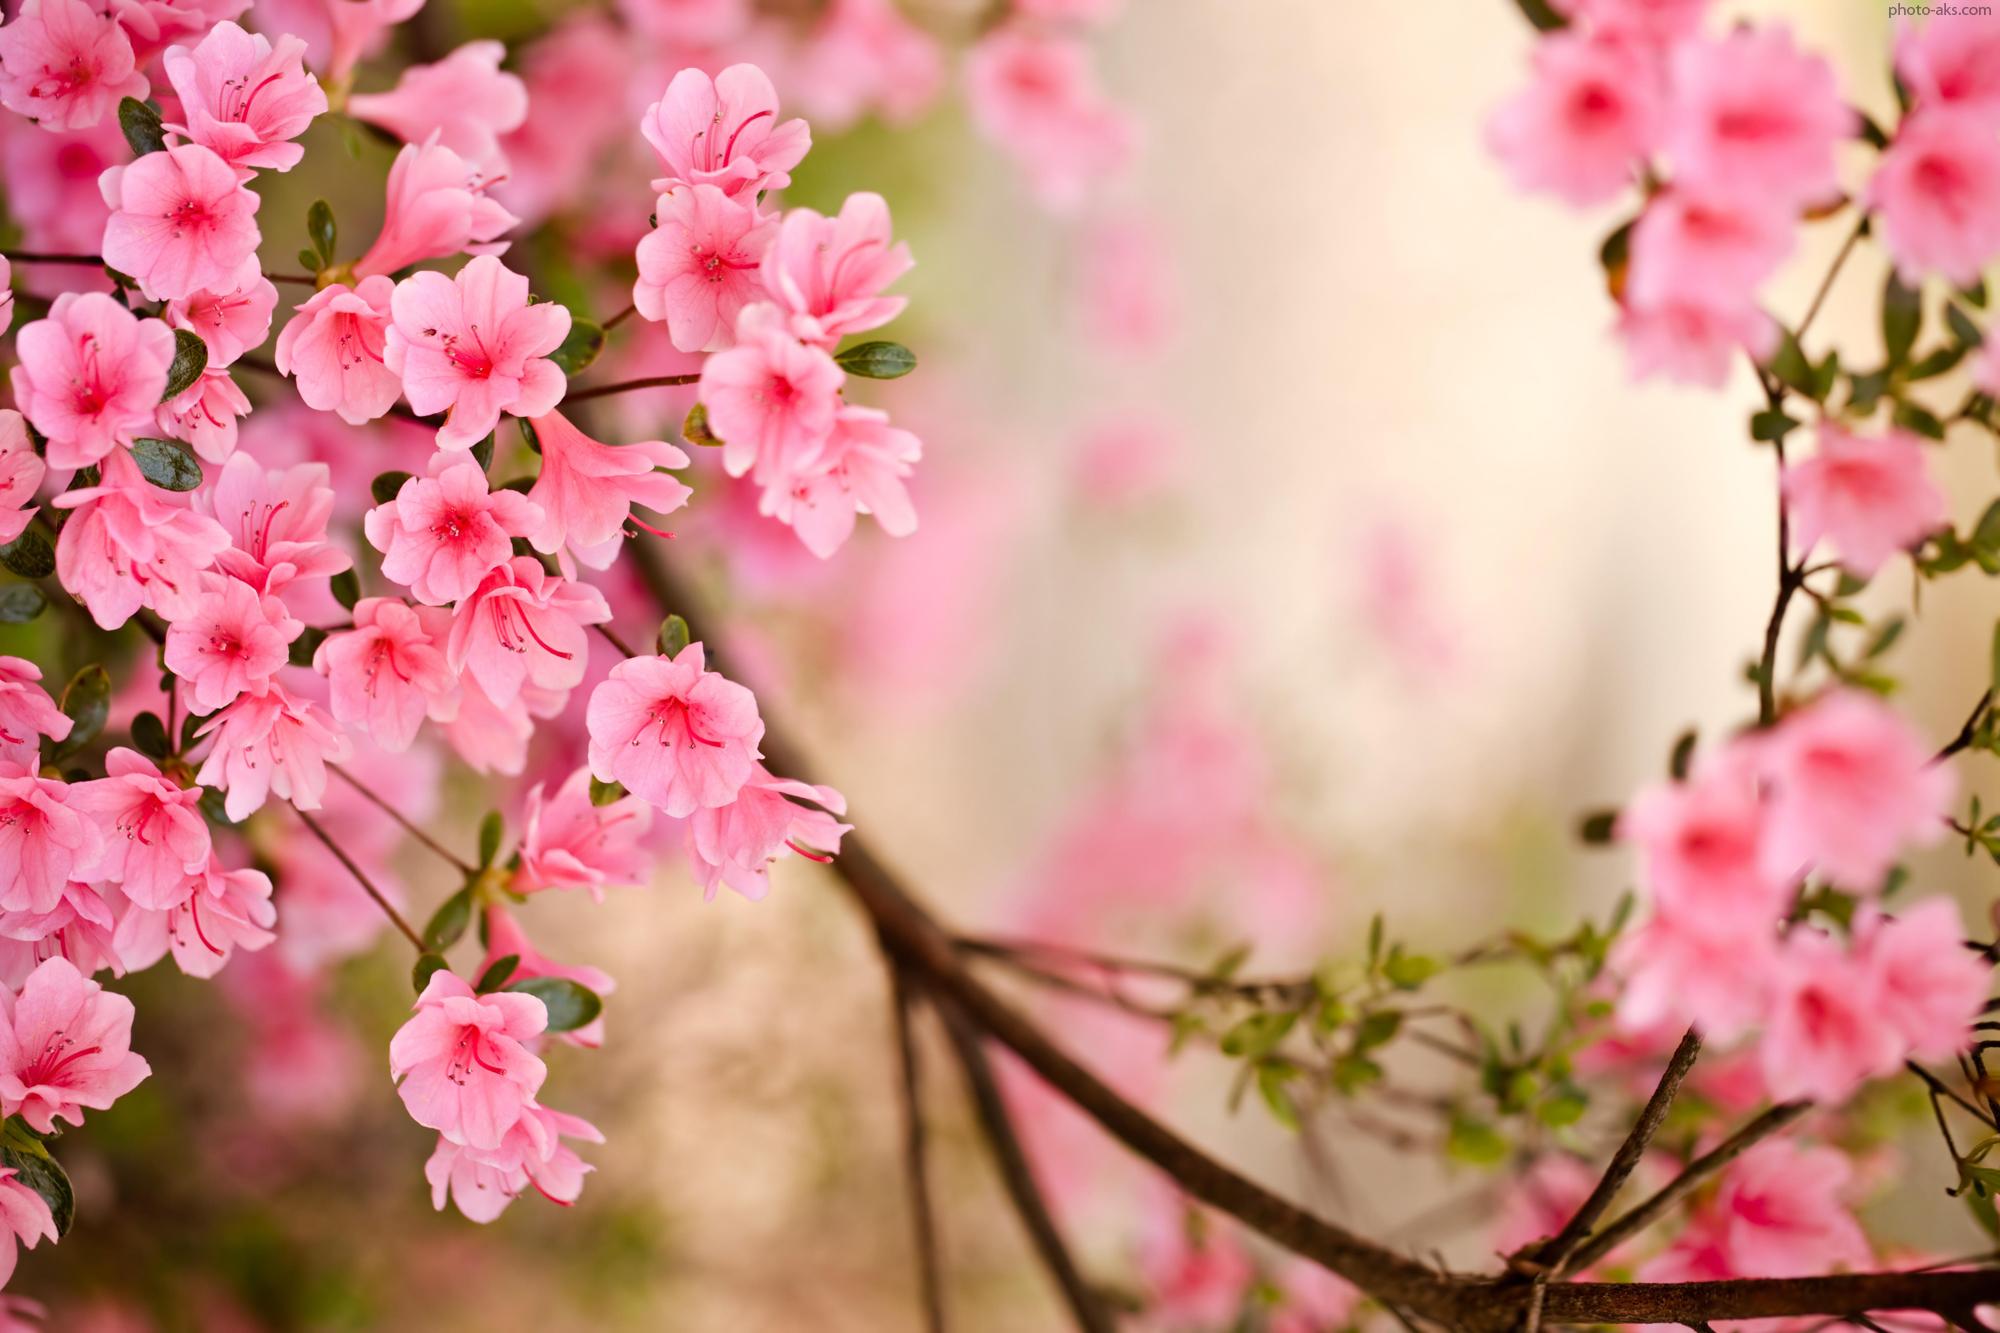 [48+] Early Spring Flowers Wallpaper on WallpaperSafari